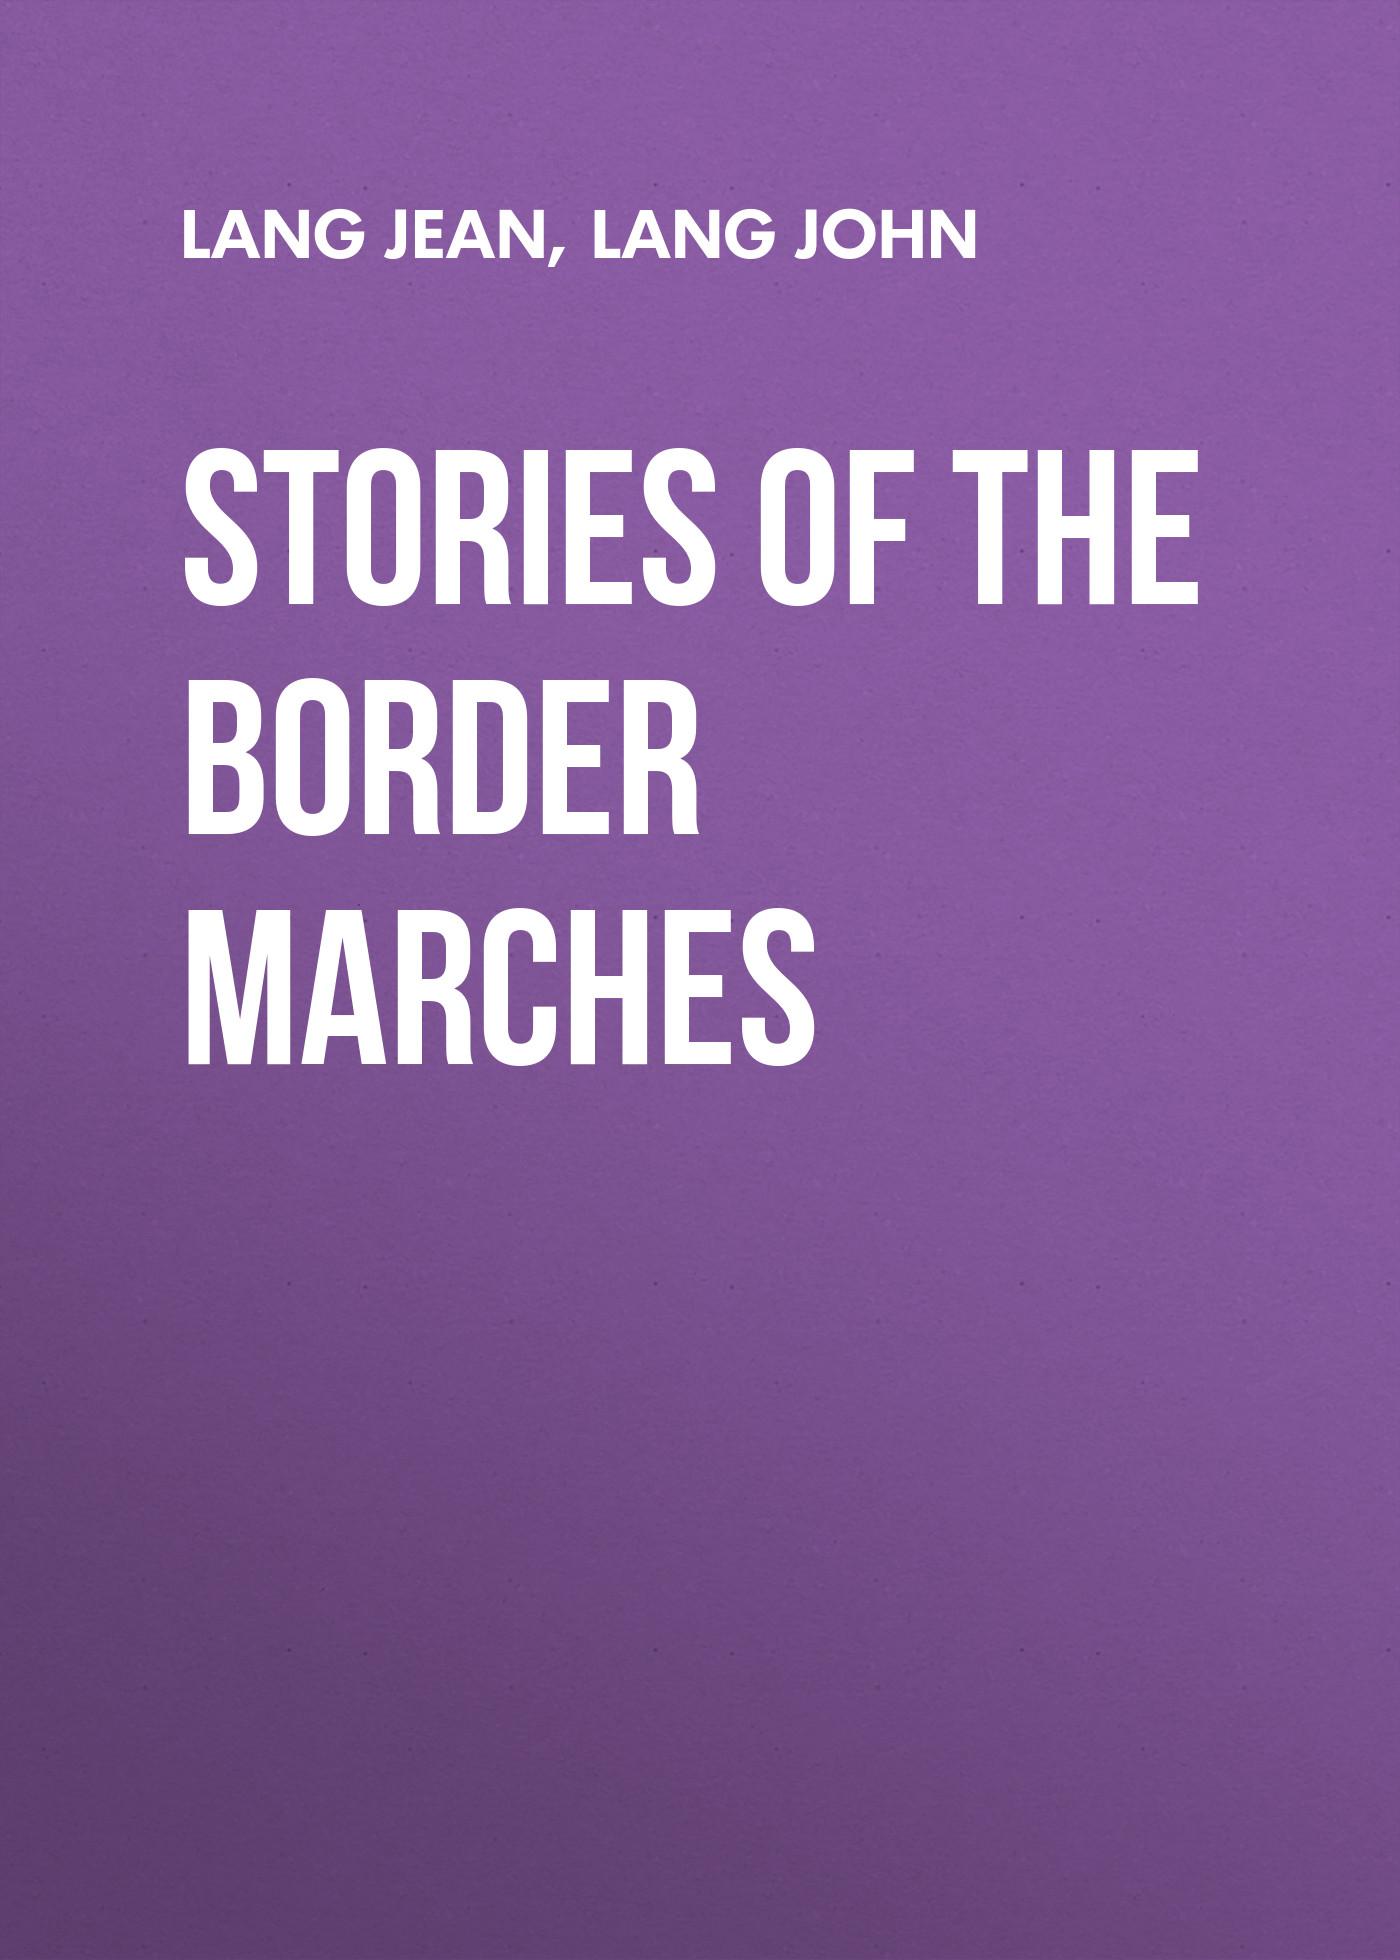 Lang John Stories of the Border Marches vitaly mushkin erotic stories top ten